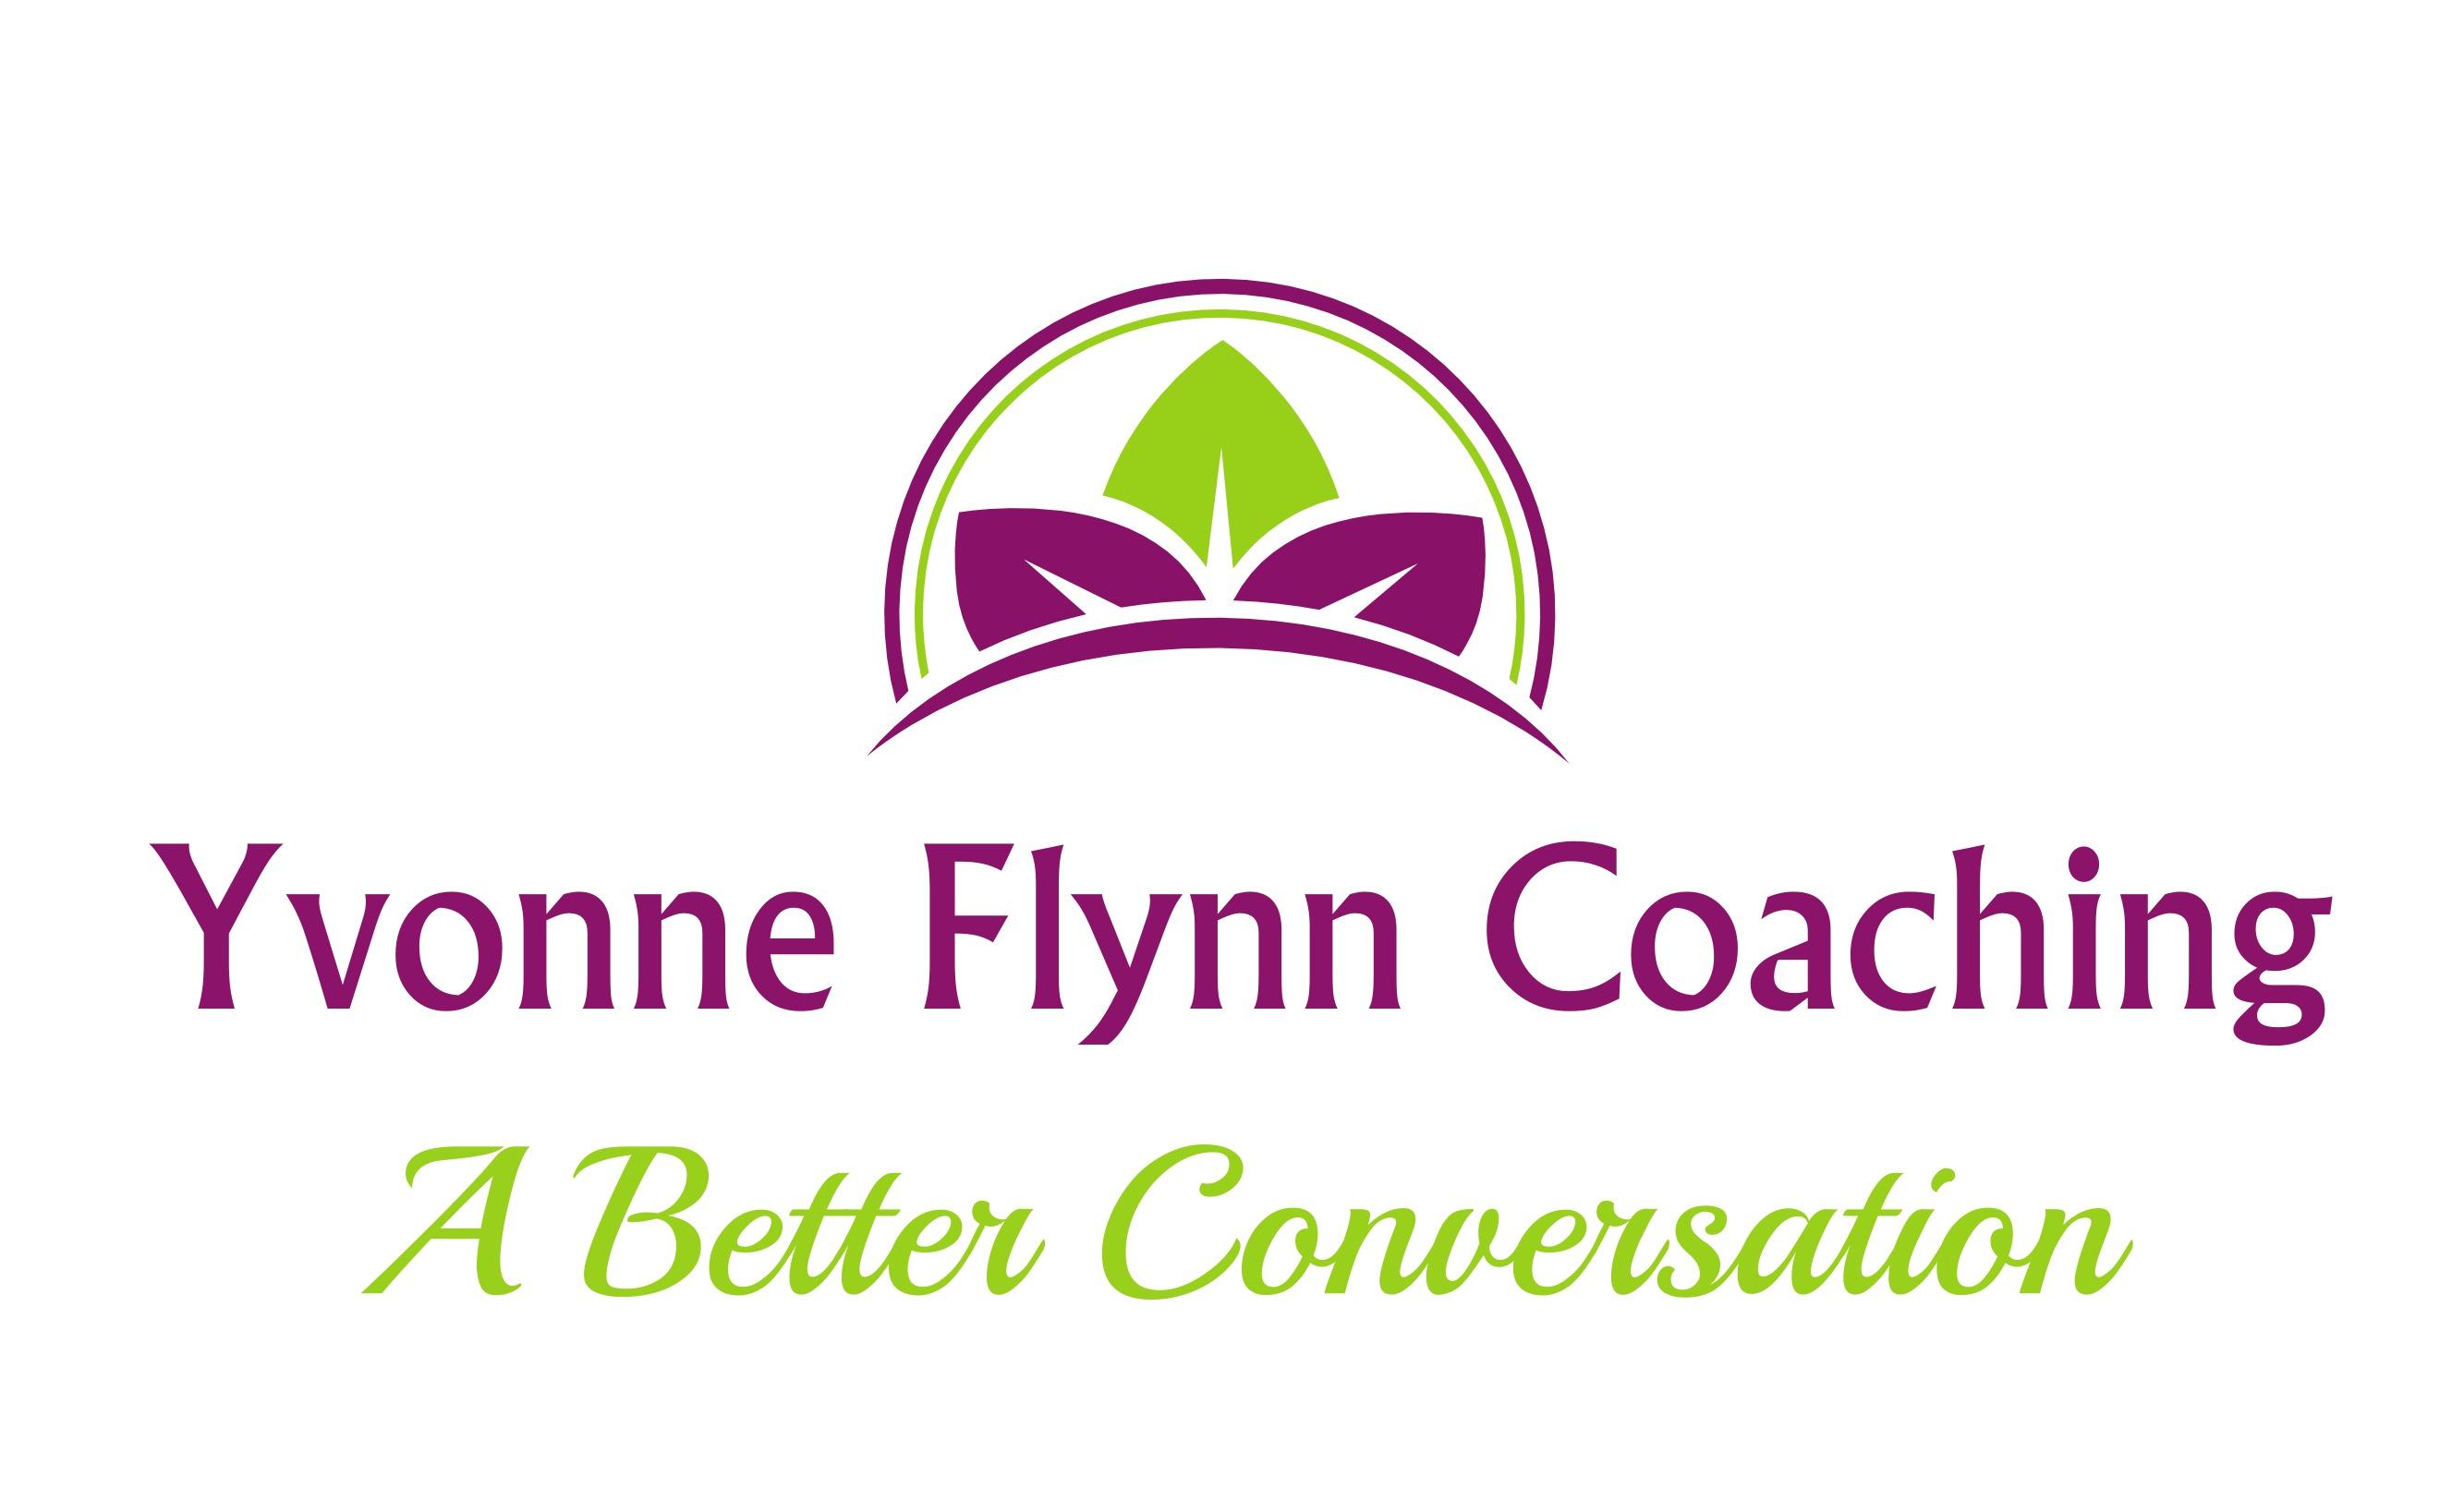 Yvonne Flynn Coaching